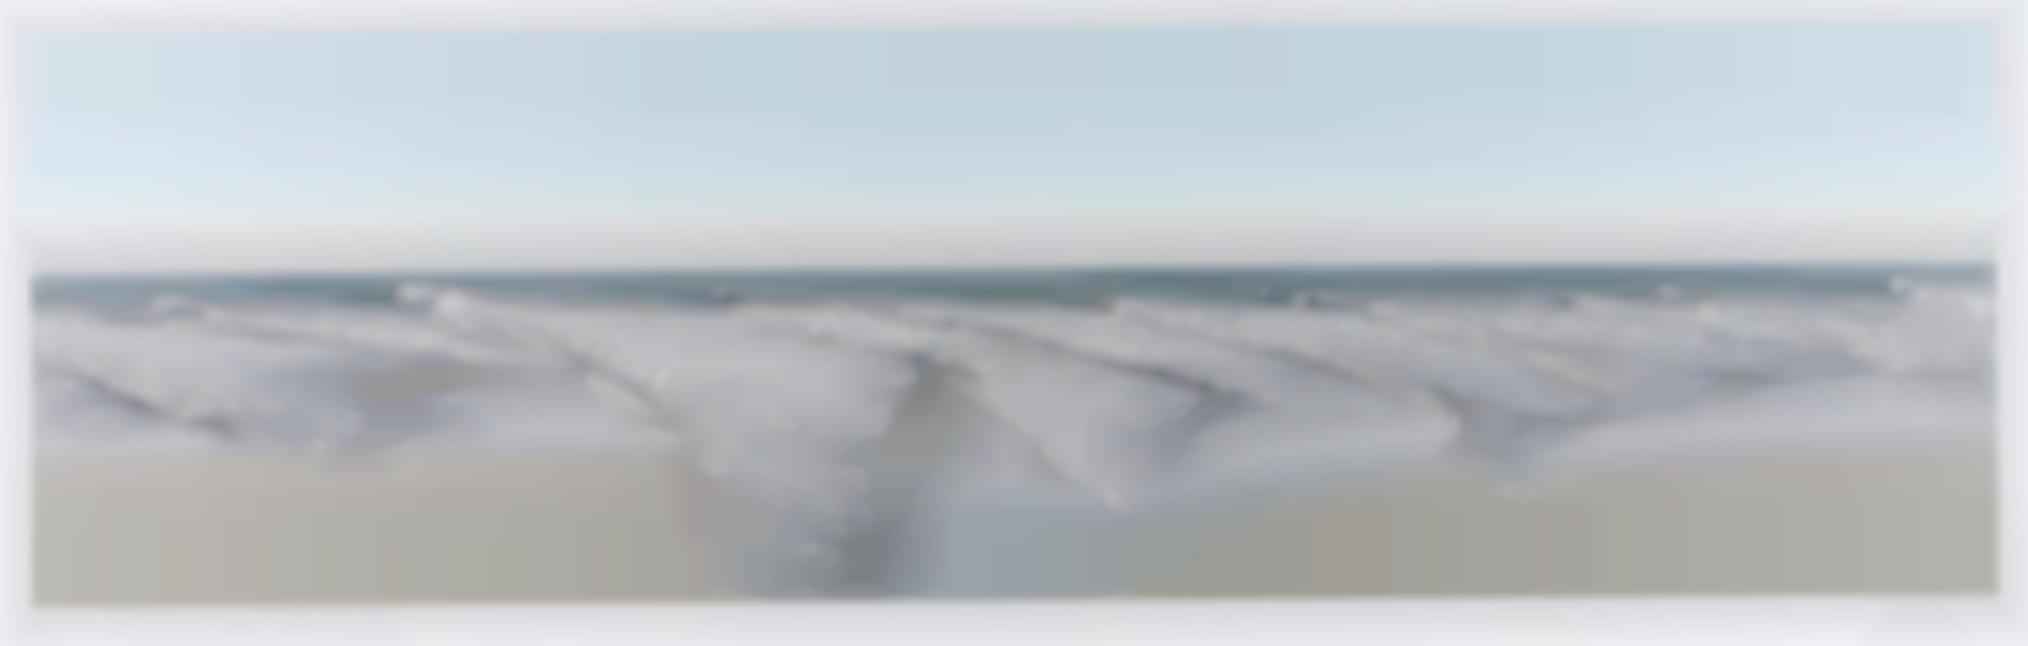 Jay Mark Johnson - Point Dume Waves #1-2009